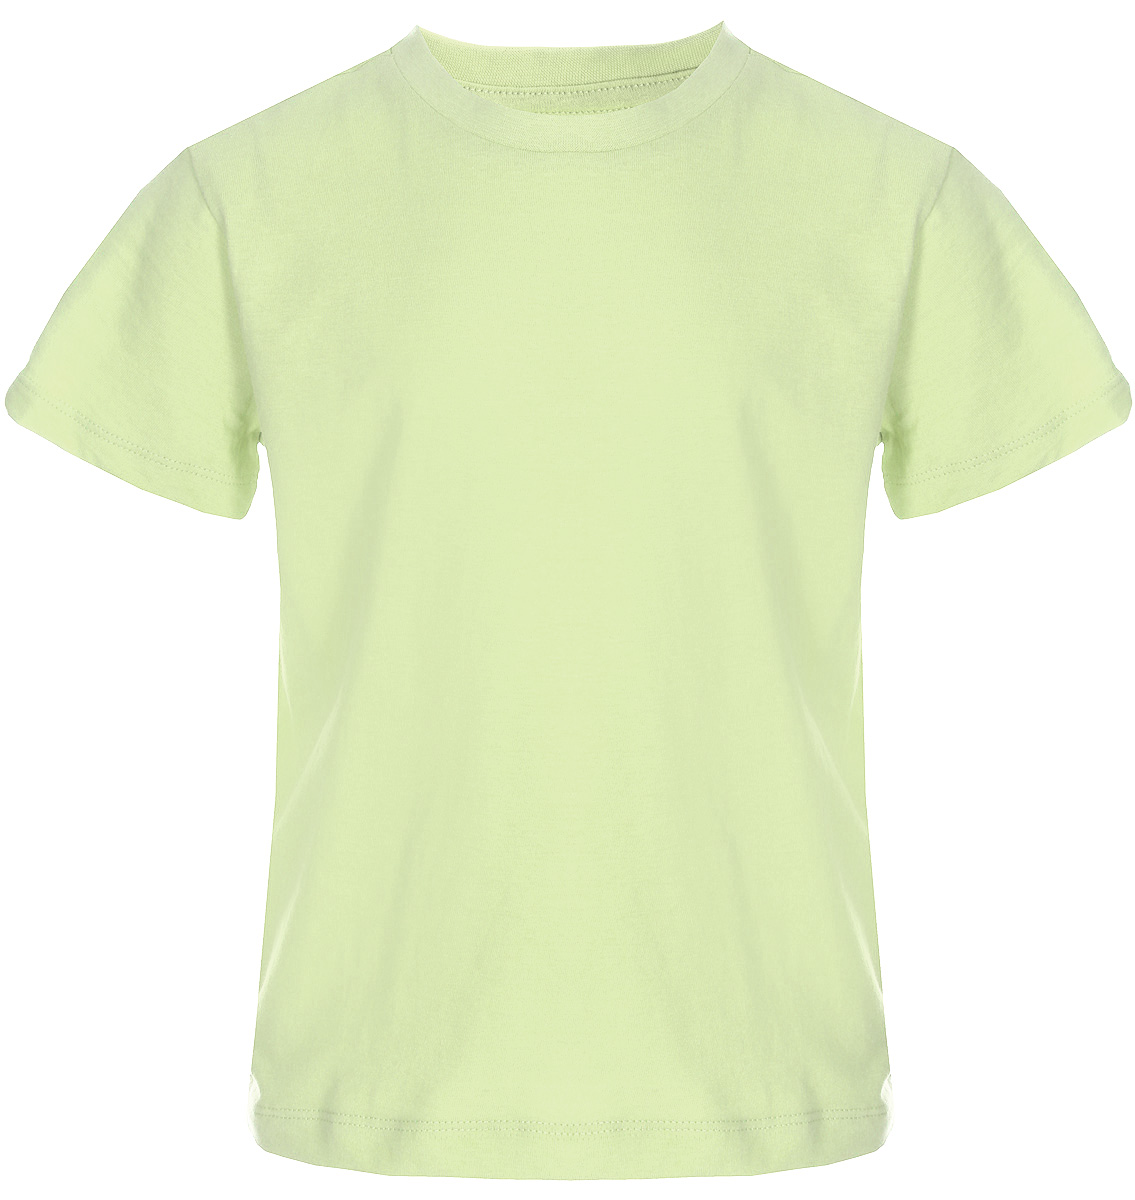 Футболка для мальчика Sela, цвет: желтый. Ts-711/533-8223. Размер 116 цена